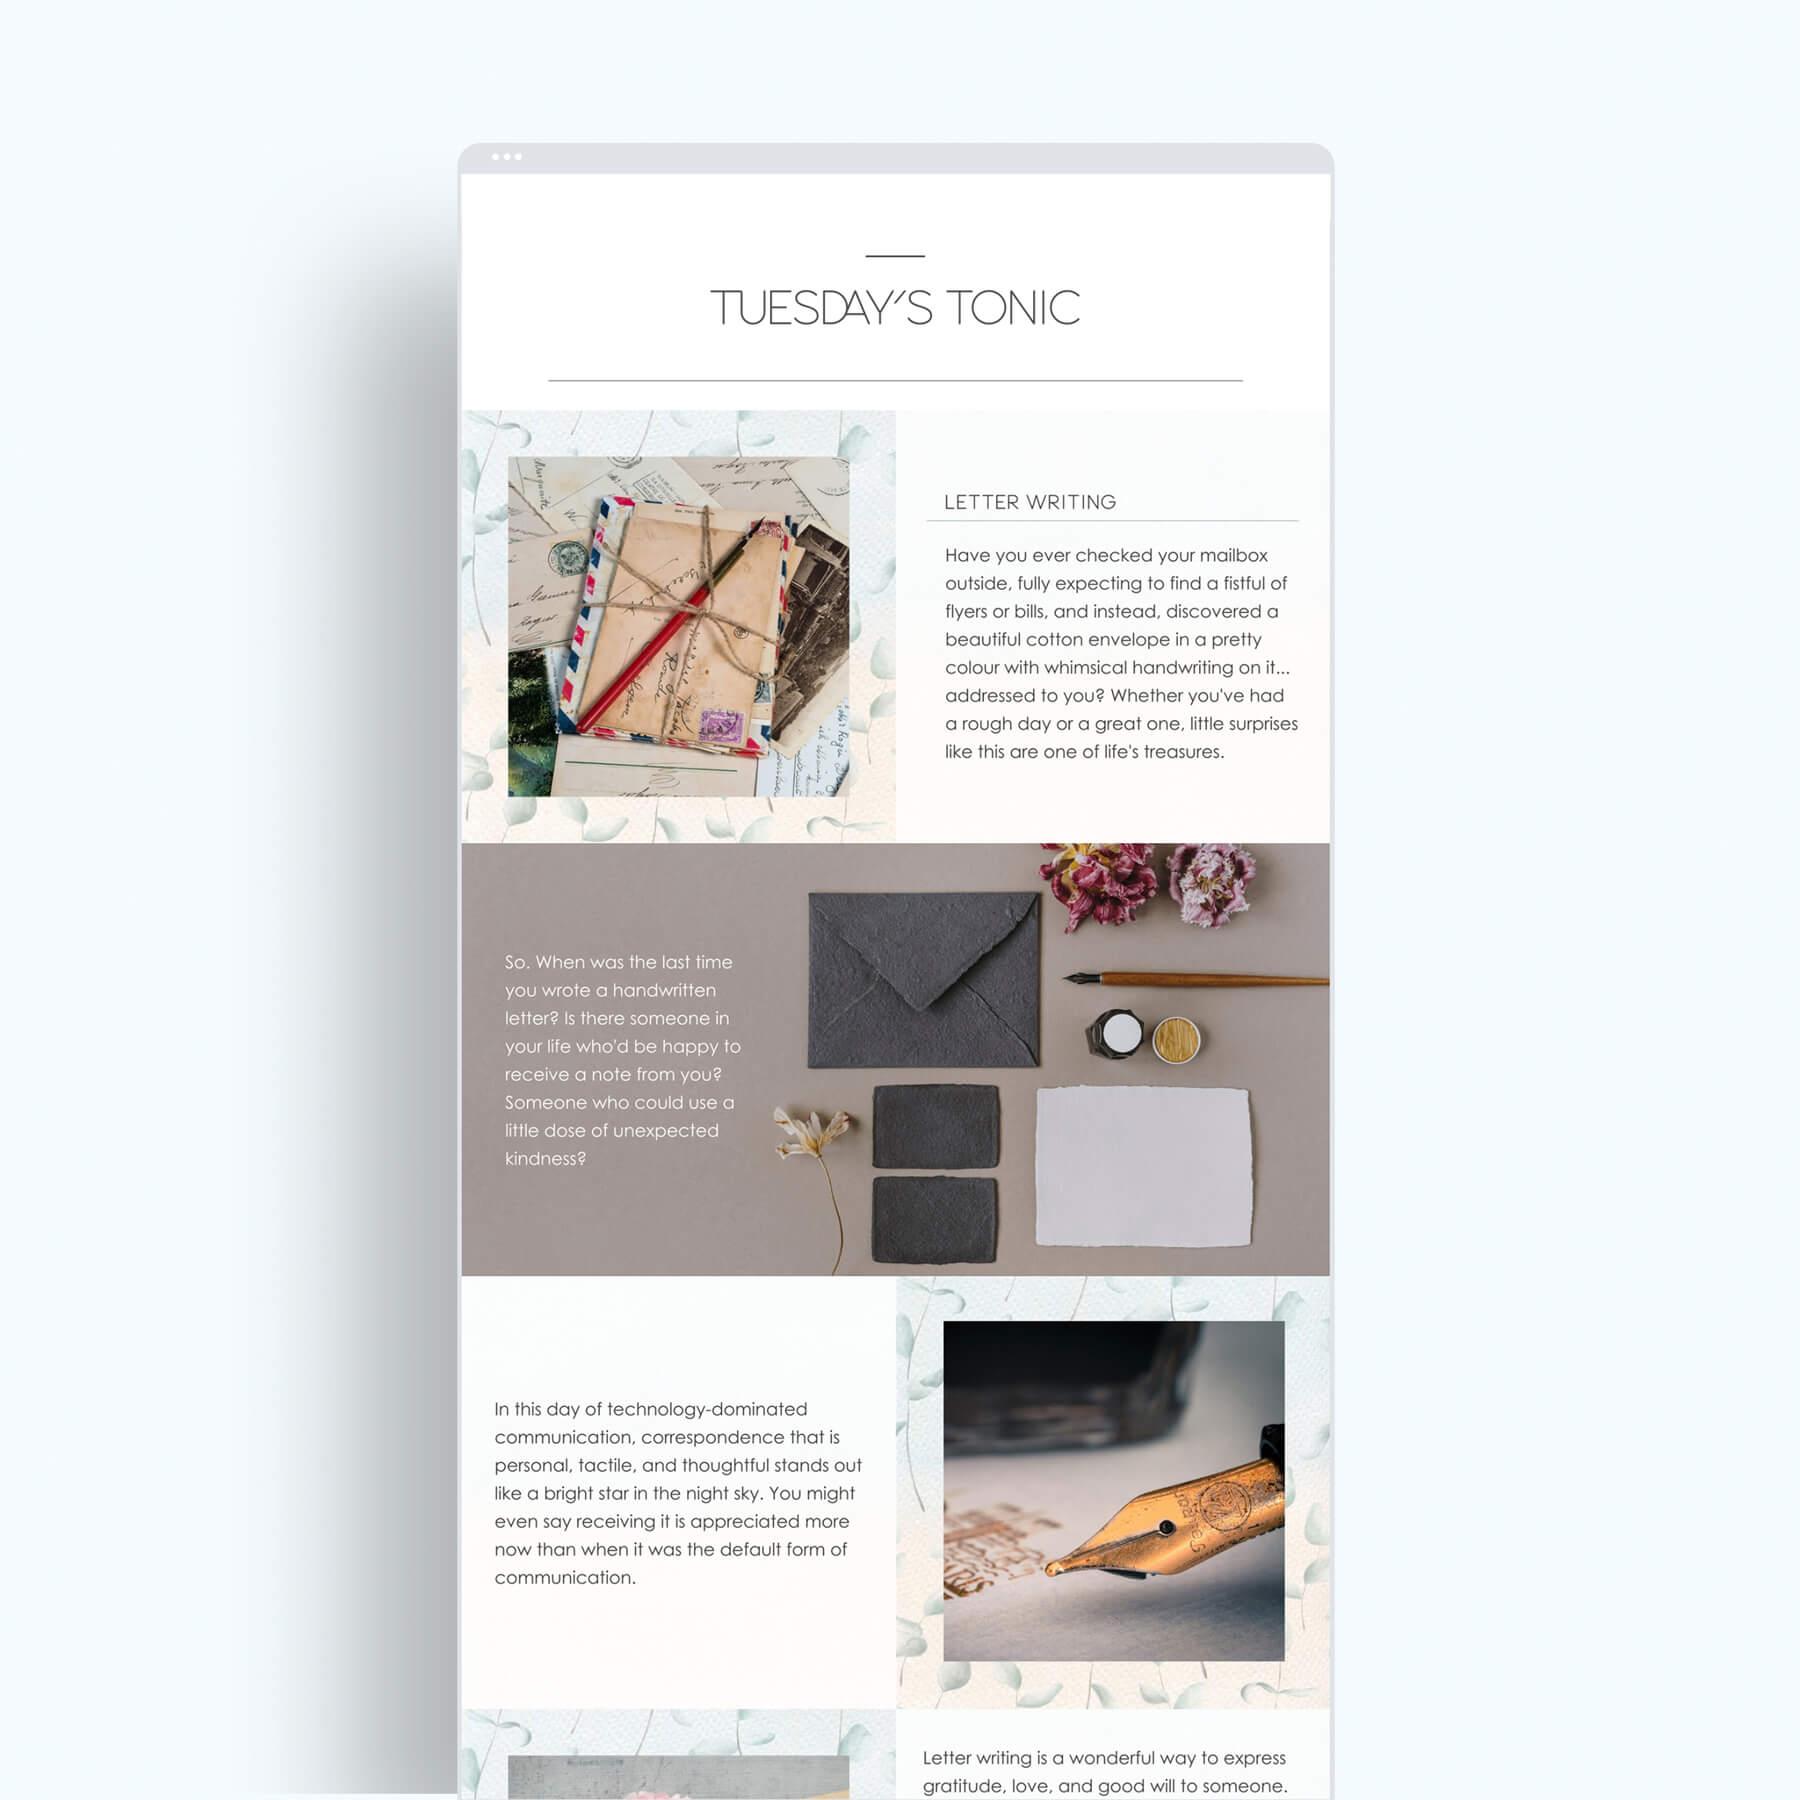 Tuesday's Tonic Newsletter Design